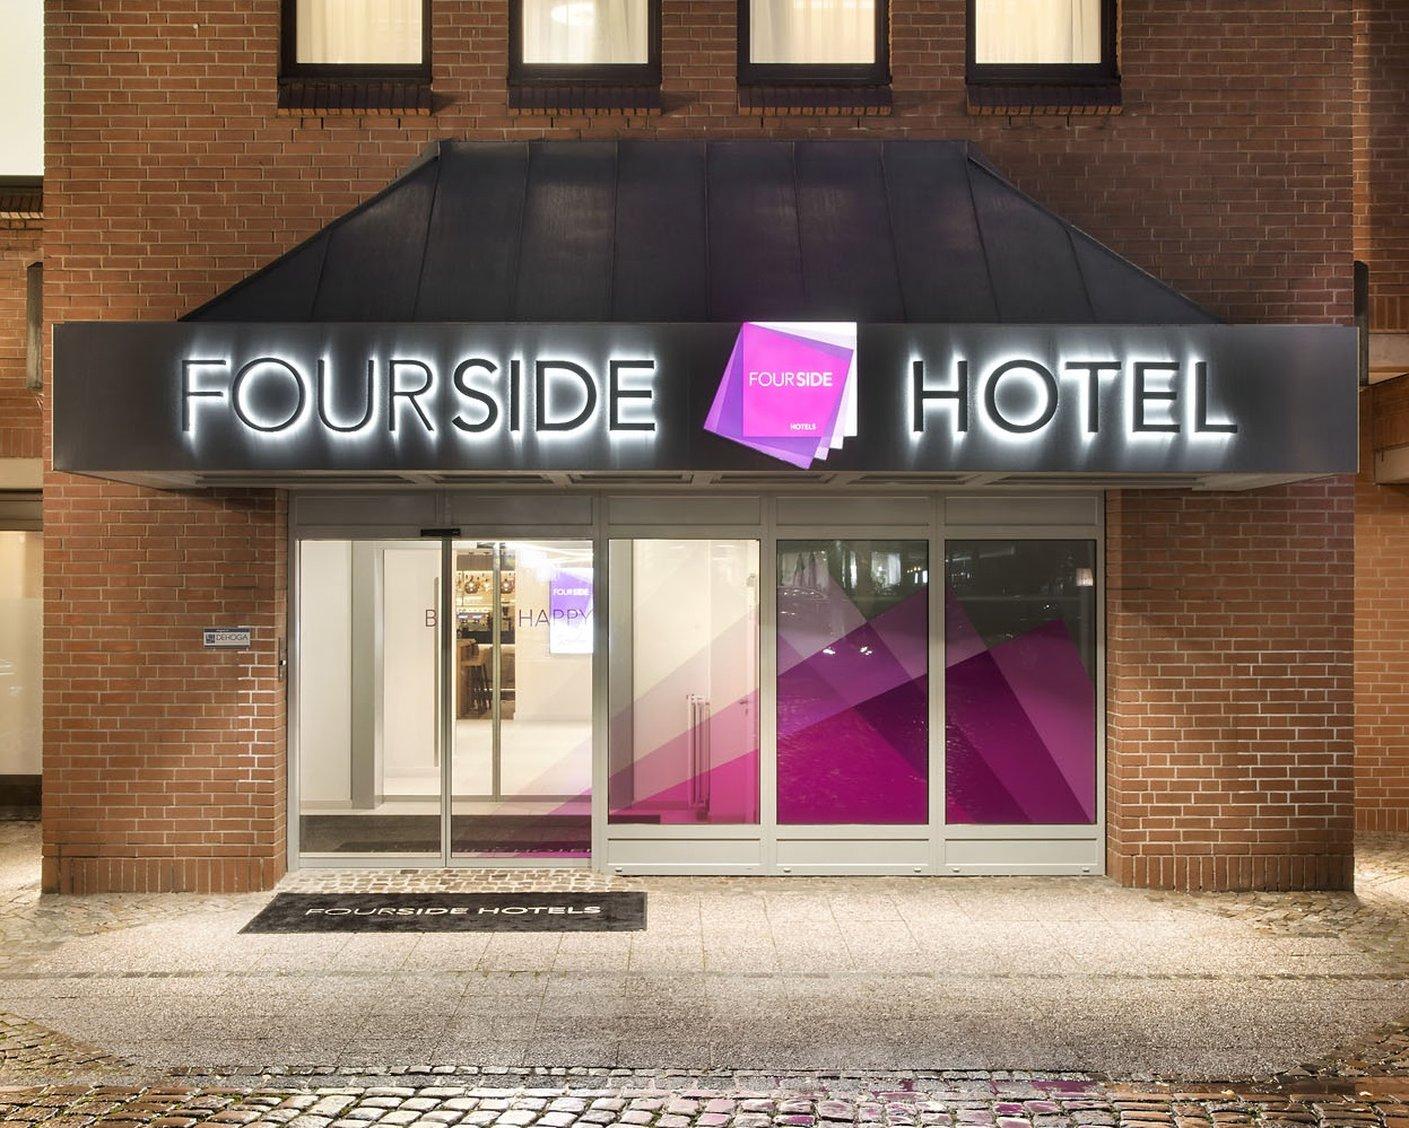 Fourside Hotel